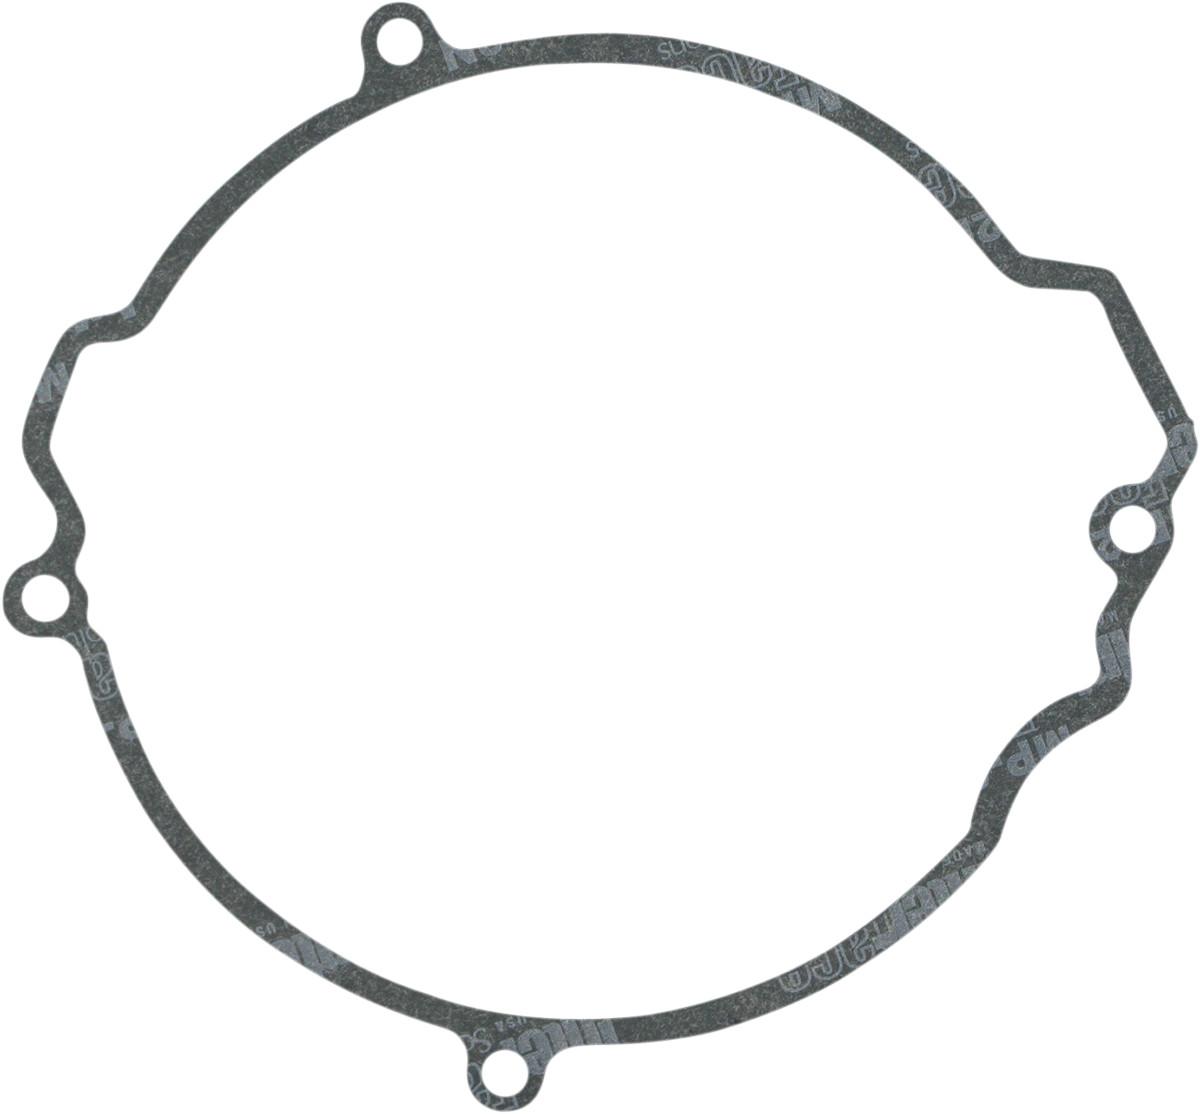 Winderosa 817521 Clutch Cover Gasket